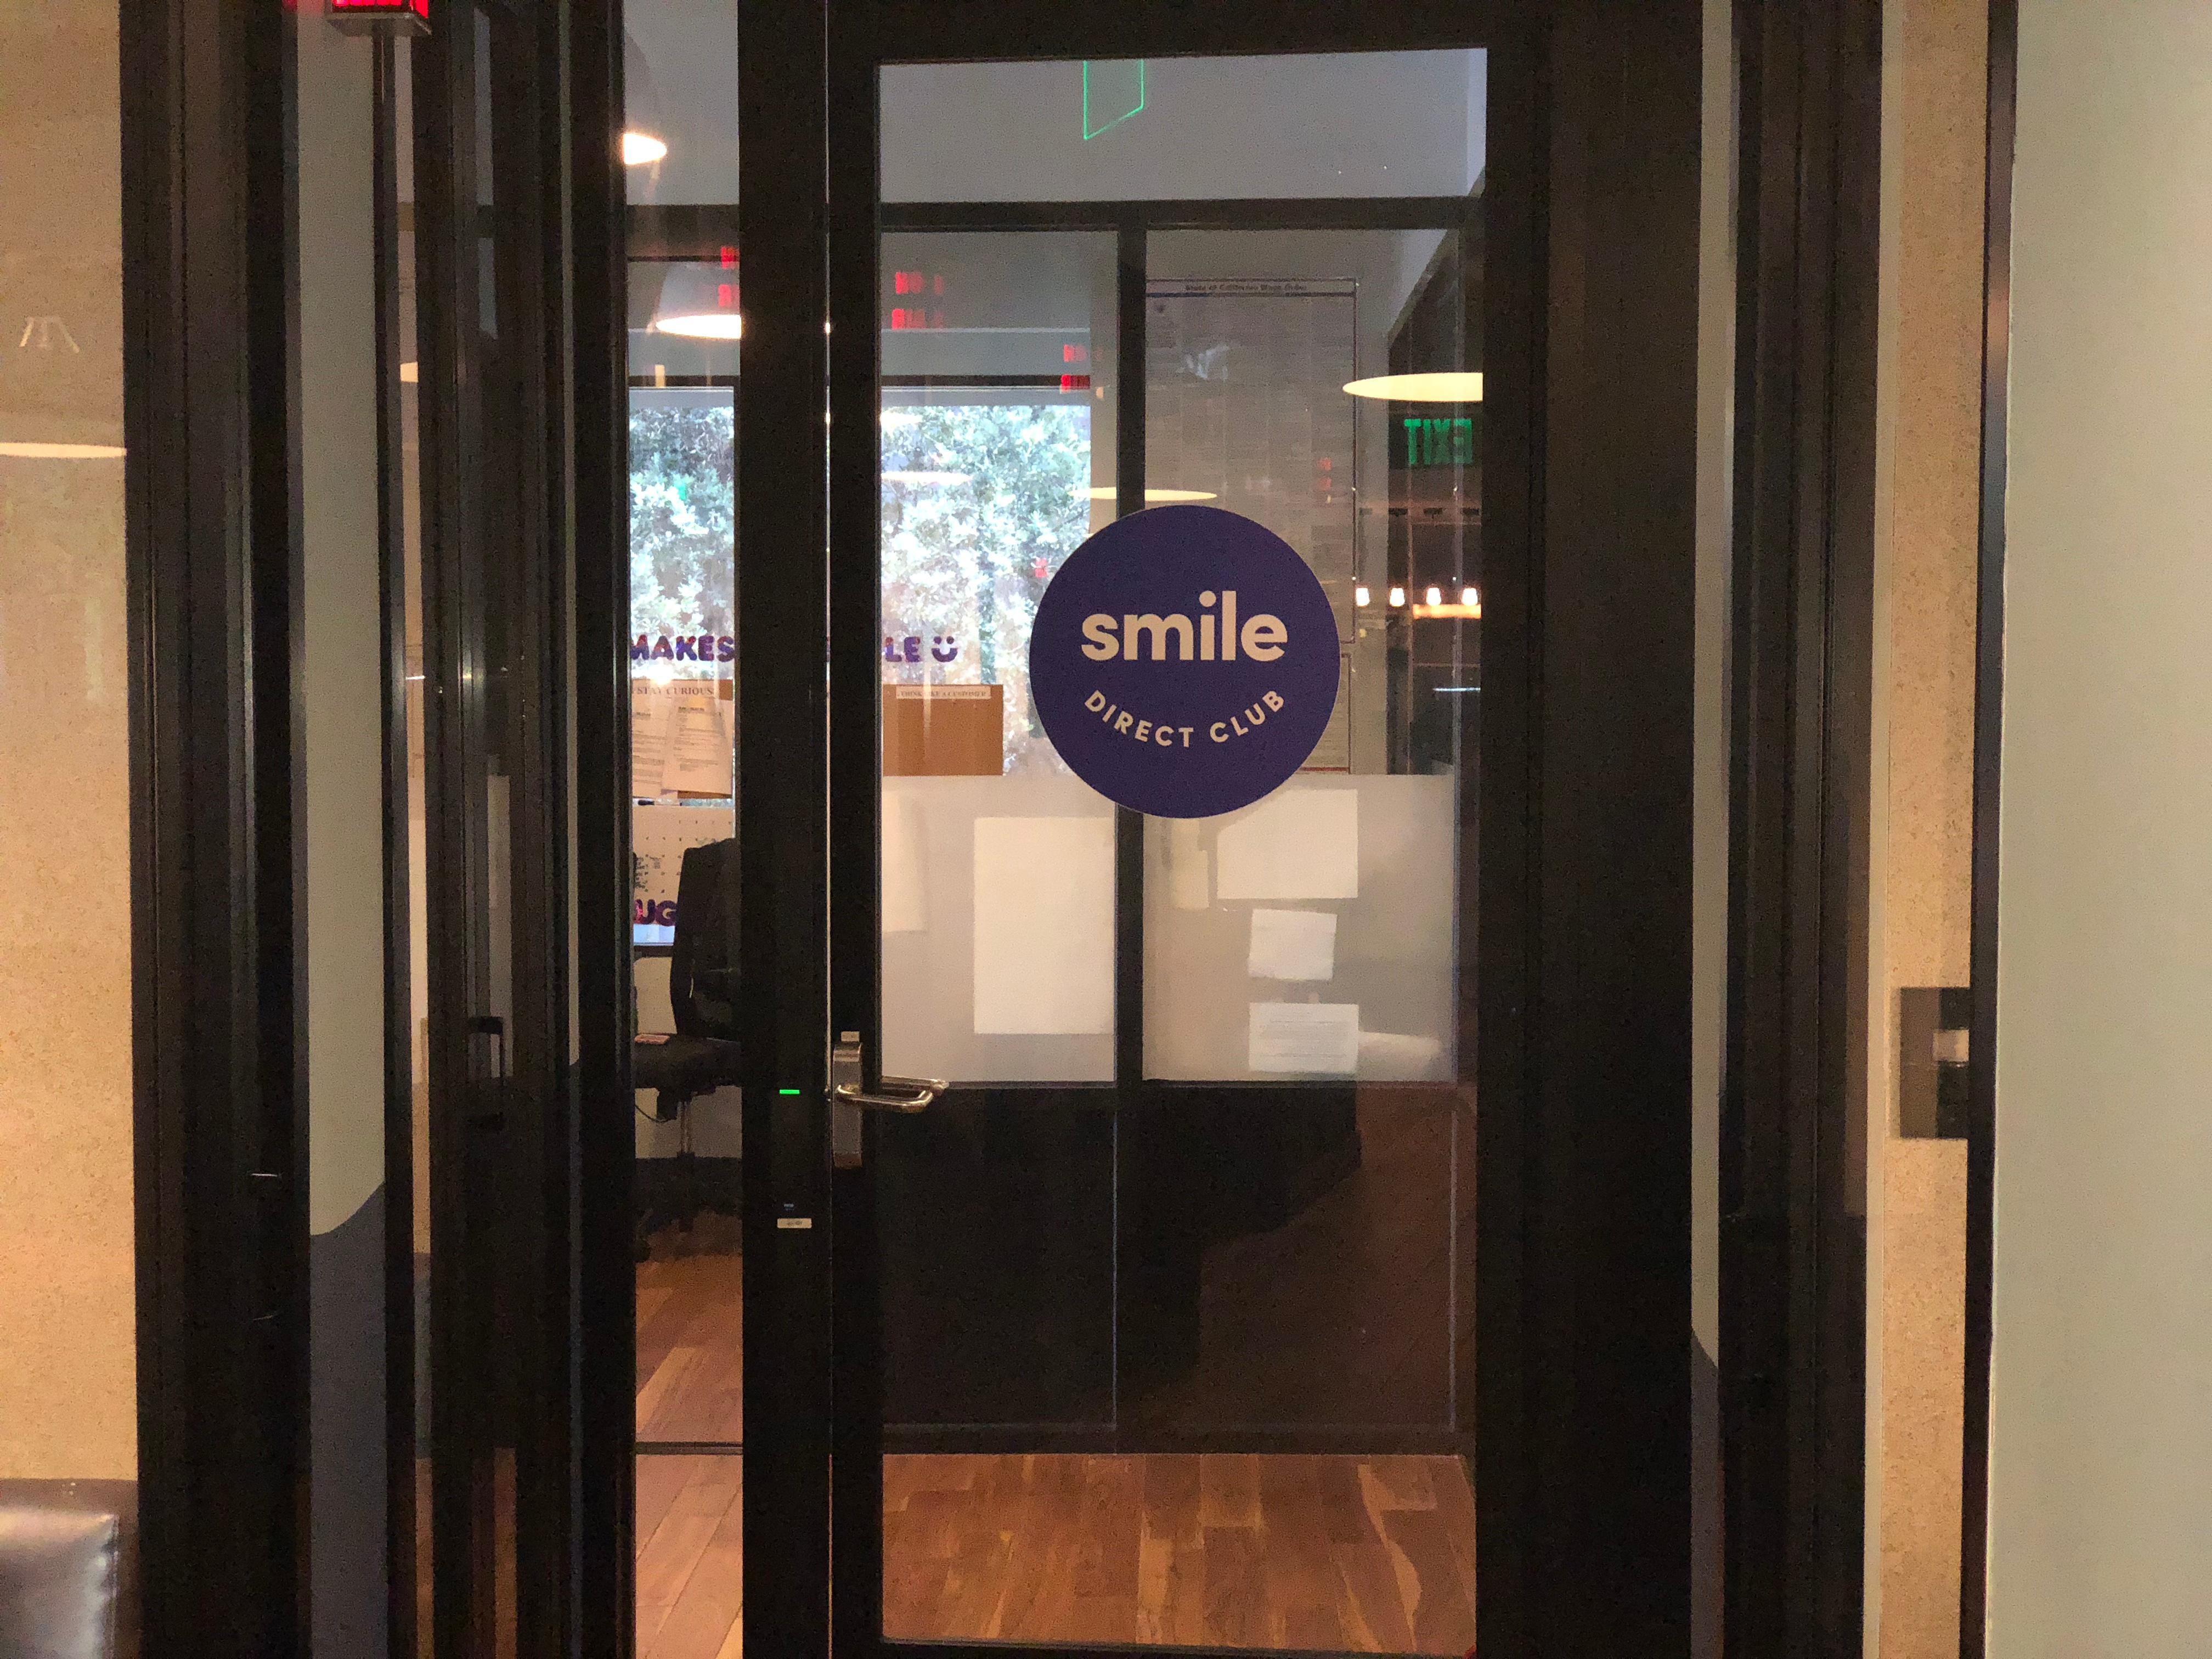 Smile Direct Club image 4